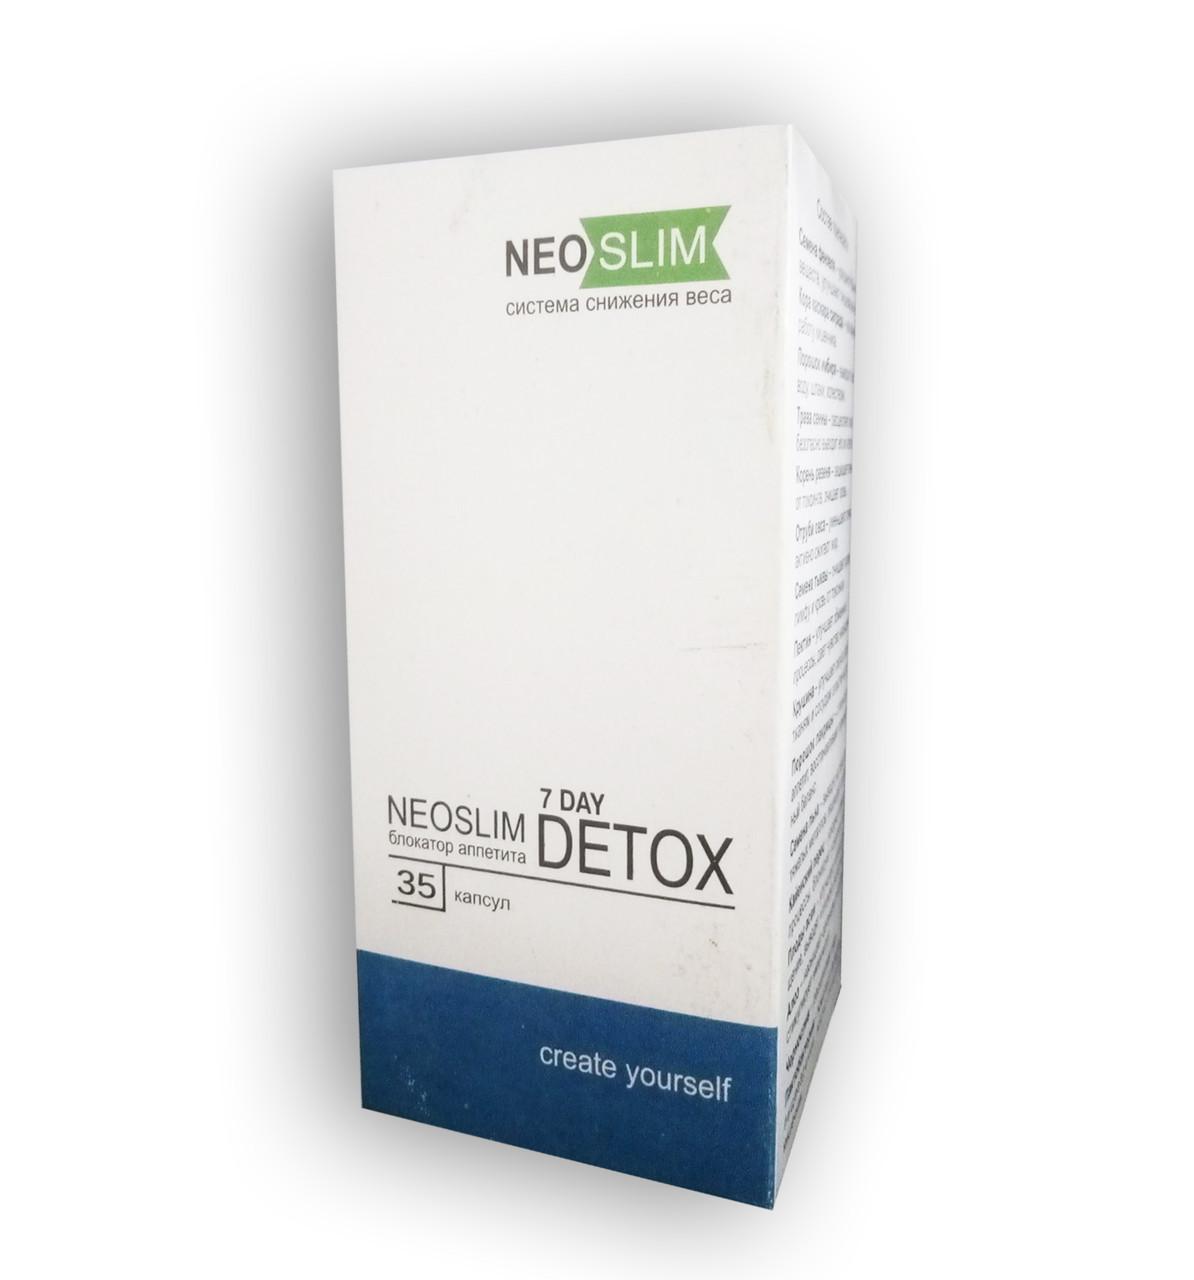 Neo Slim 7 Day Detox - Комплекс для снижения веса (Нео Слим Севен Дей Детокс)